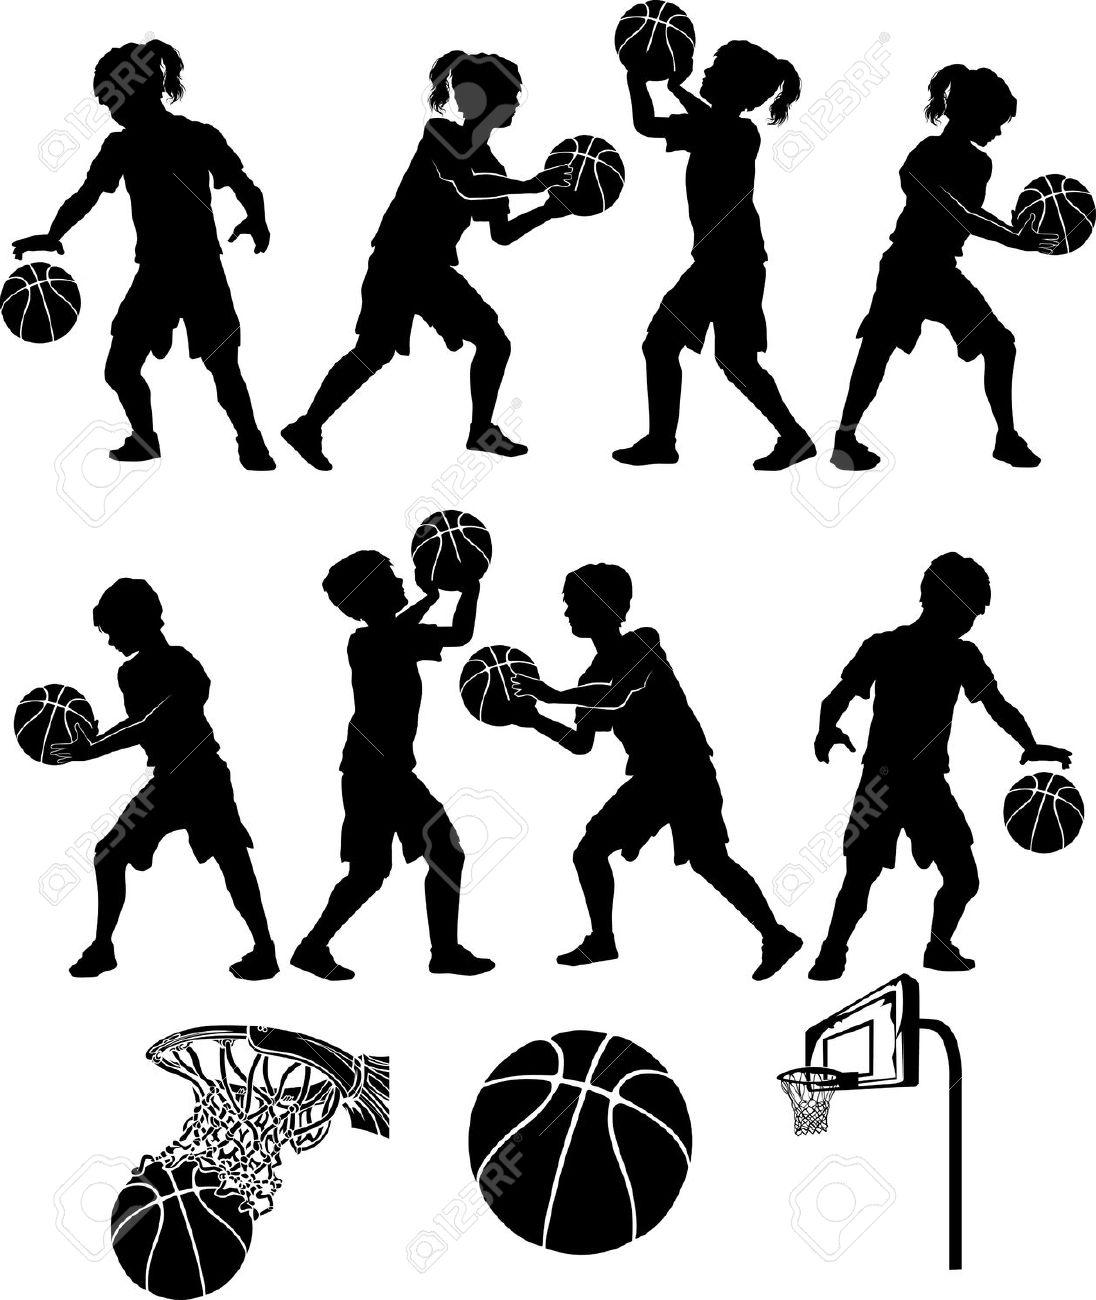 1096x1300 Boys Basketball Silhouette Clipart